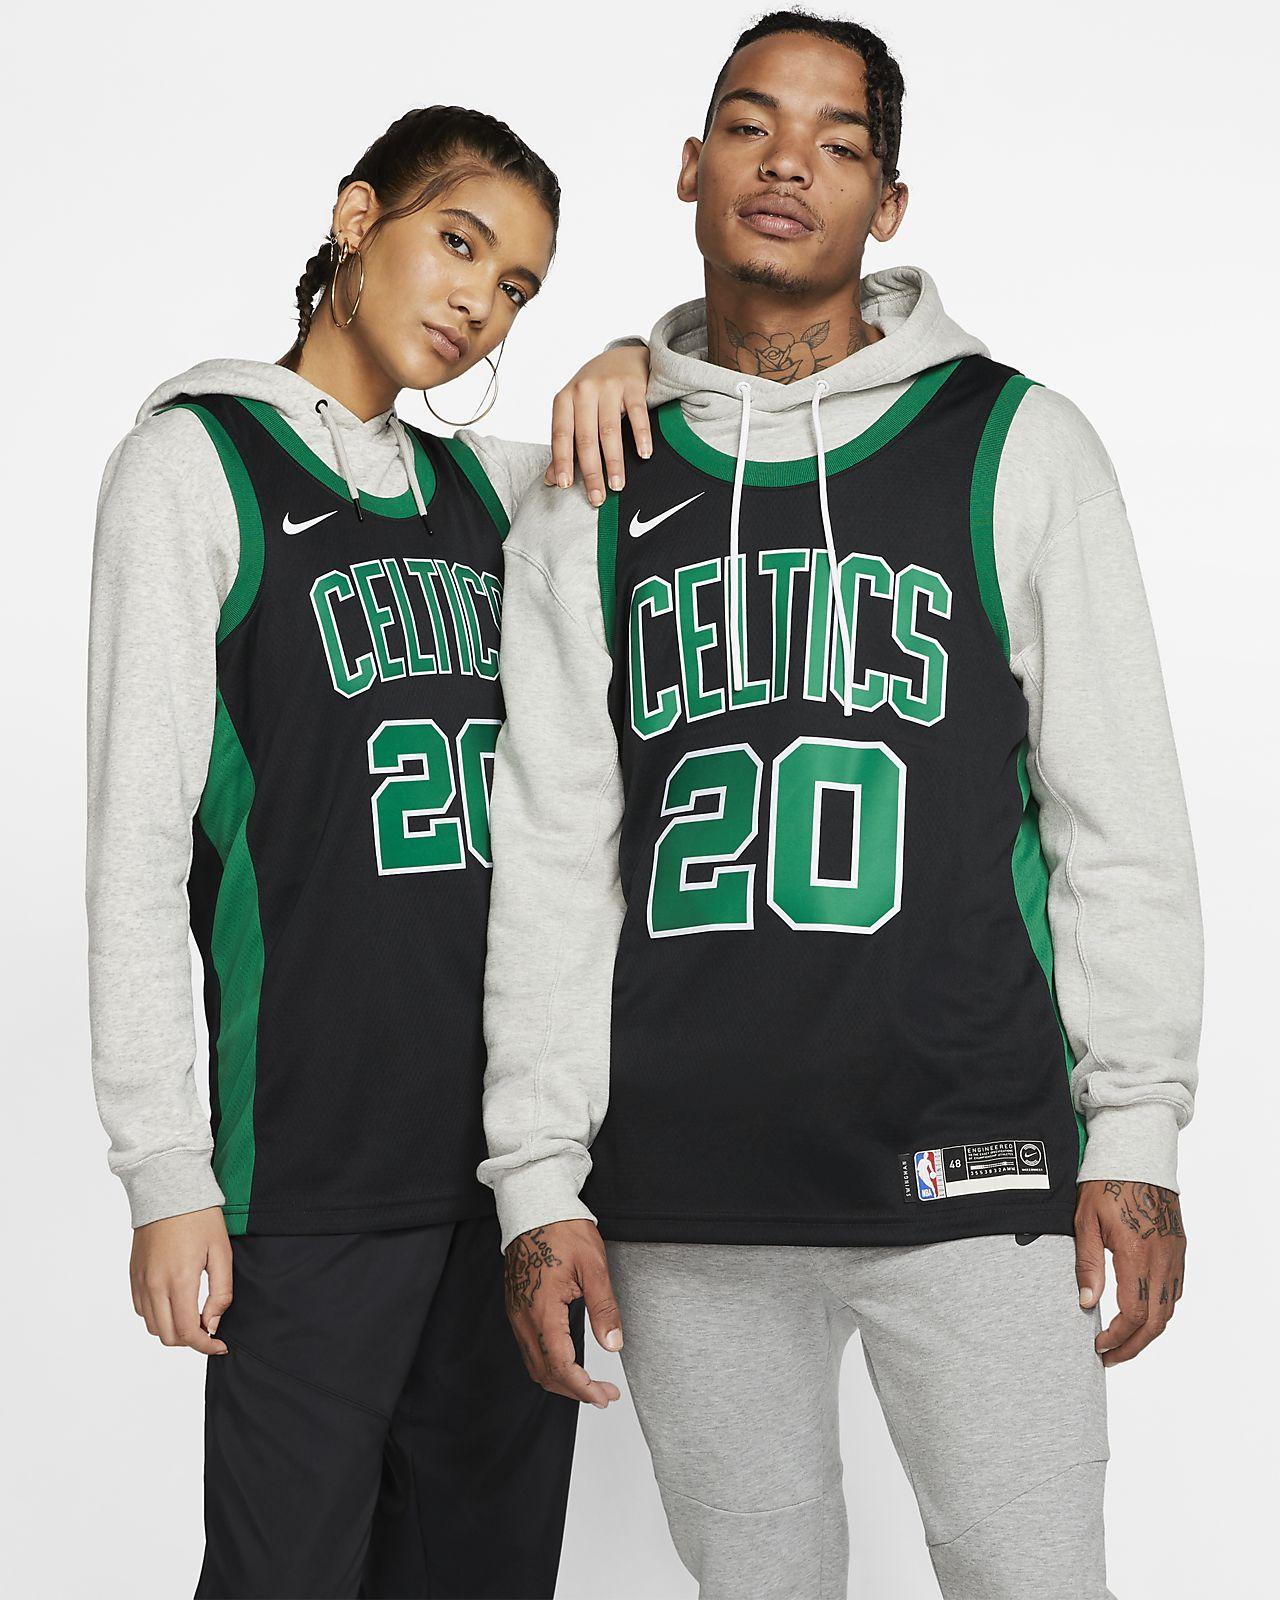 87fe595b9 Men s Nike NBA Connected Jersey. Gordon Hayward Statement Edition Swingman (Boston  Celtics)